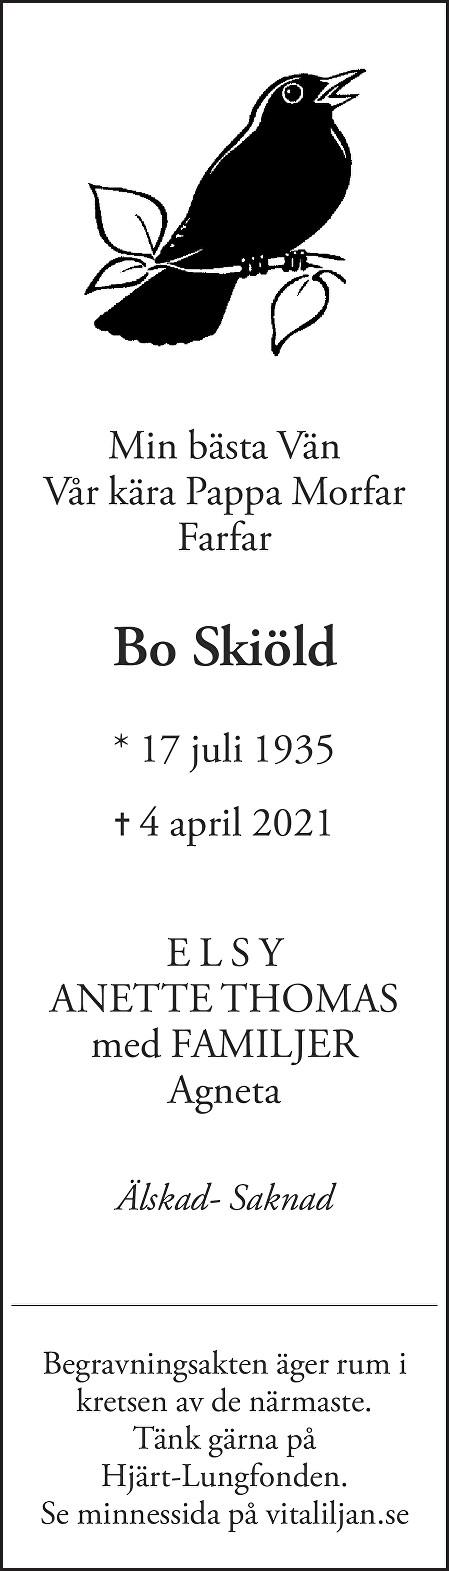 Bo Skiöld Death notice